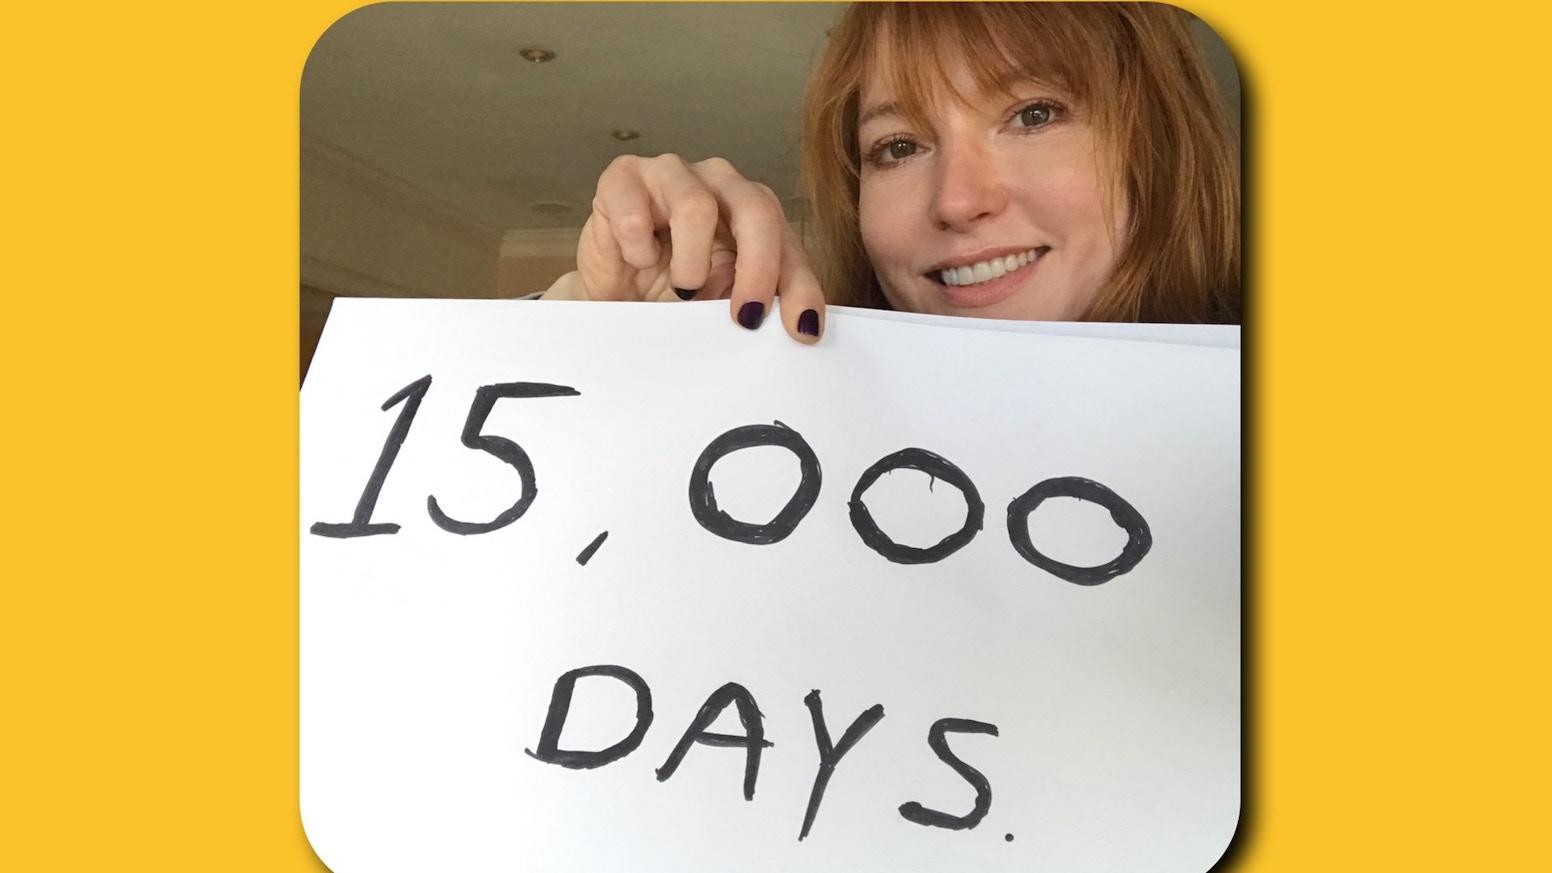 15000 Days By Alicia Witt The Album By Alicia Witt Kickstarter